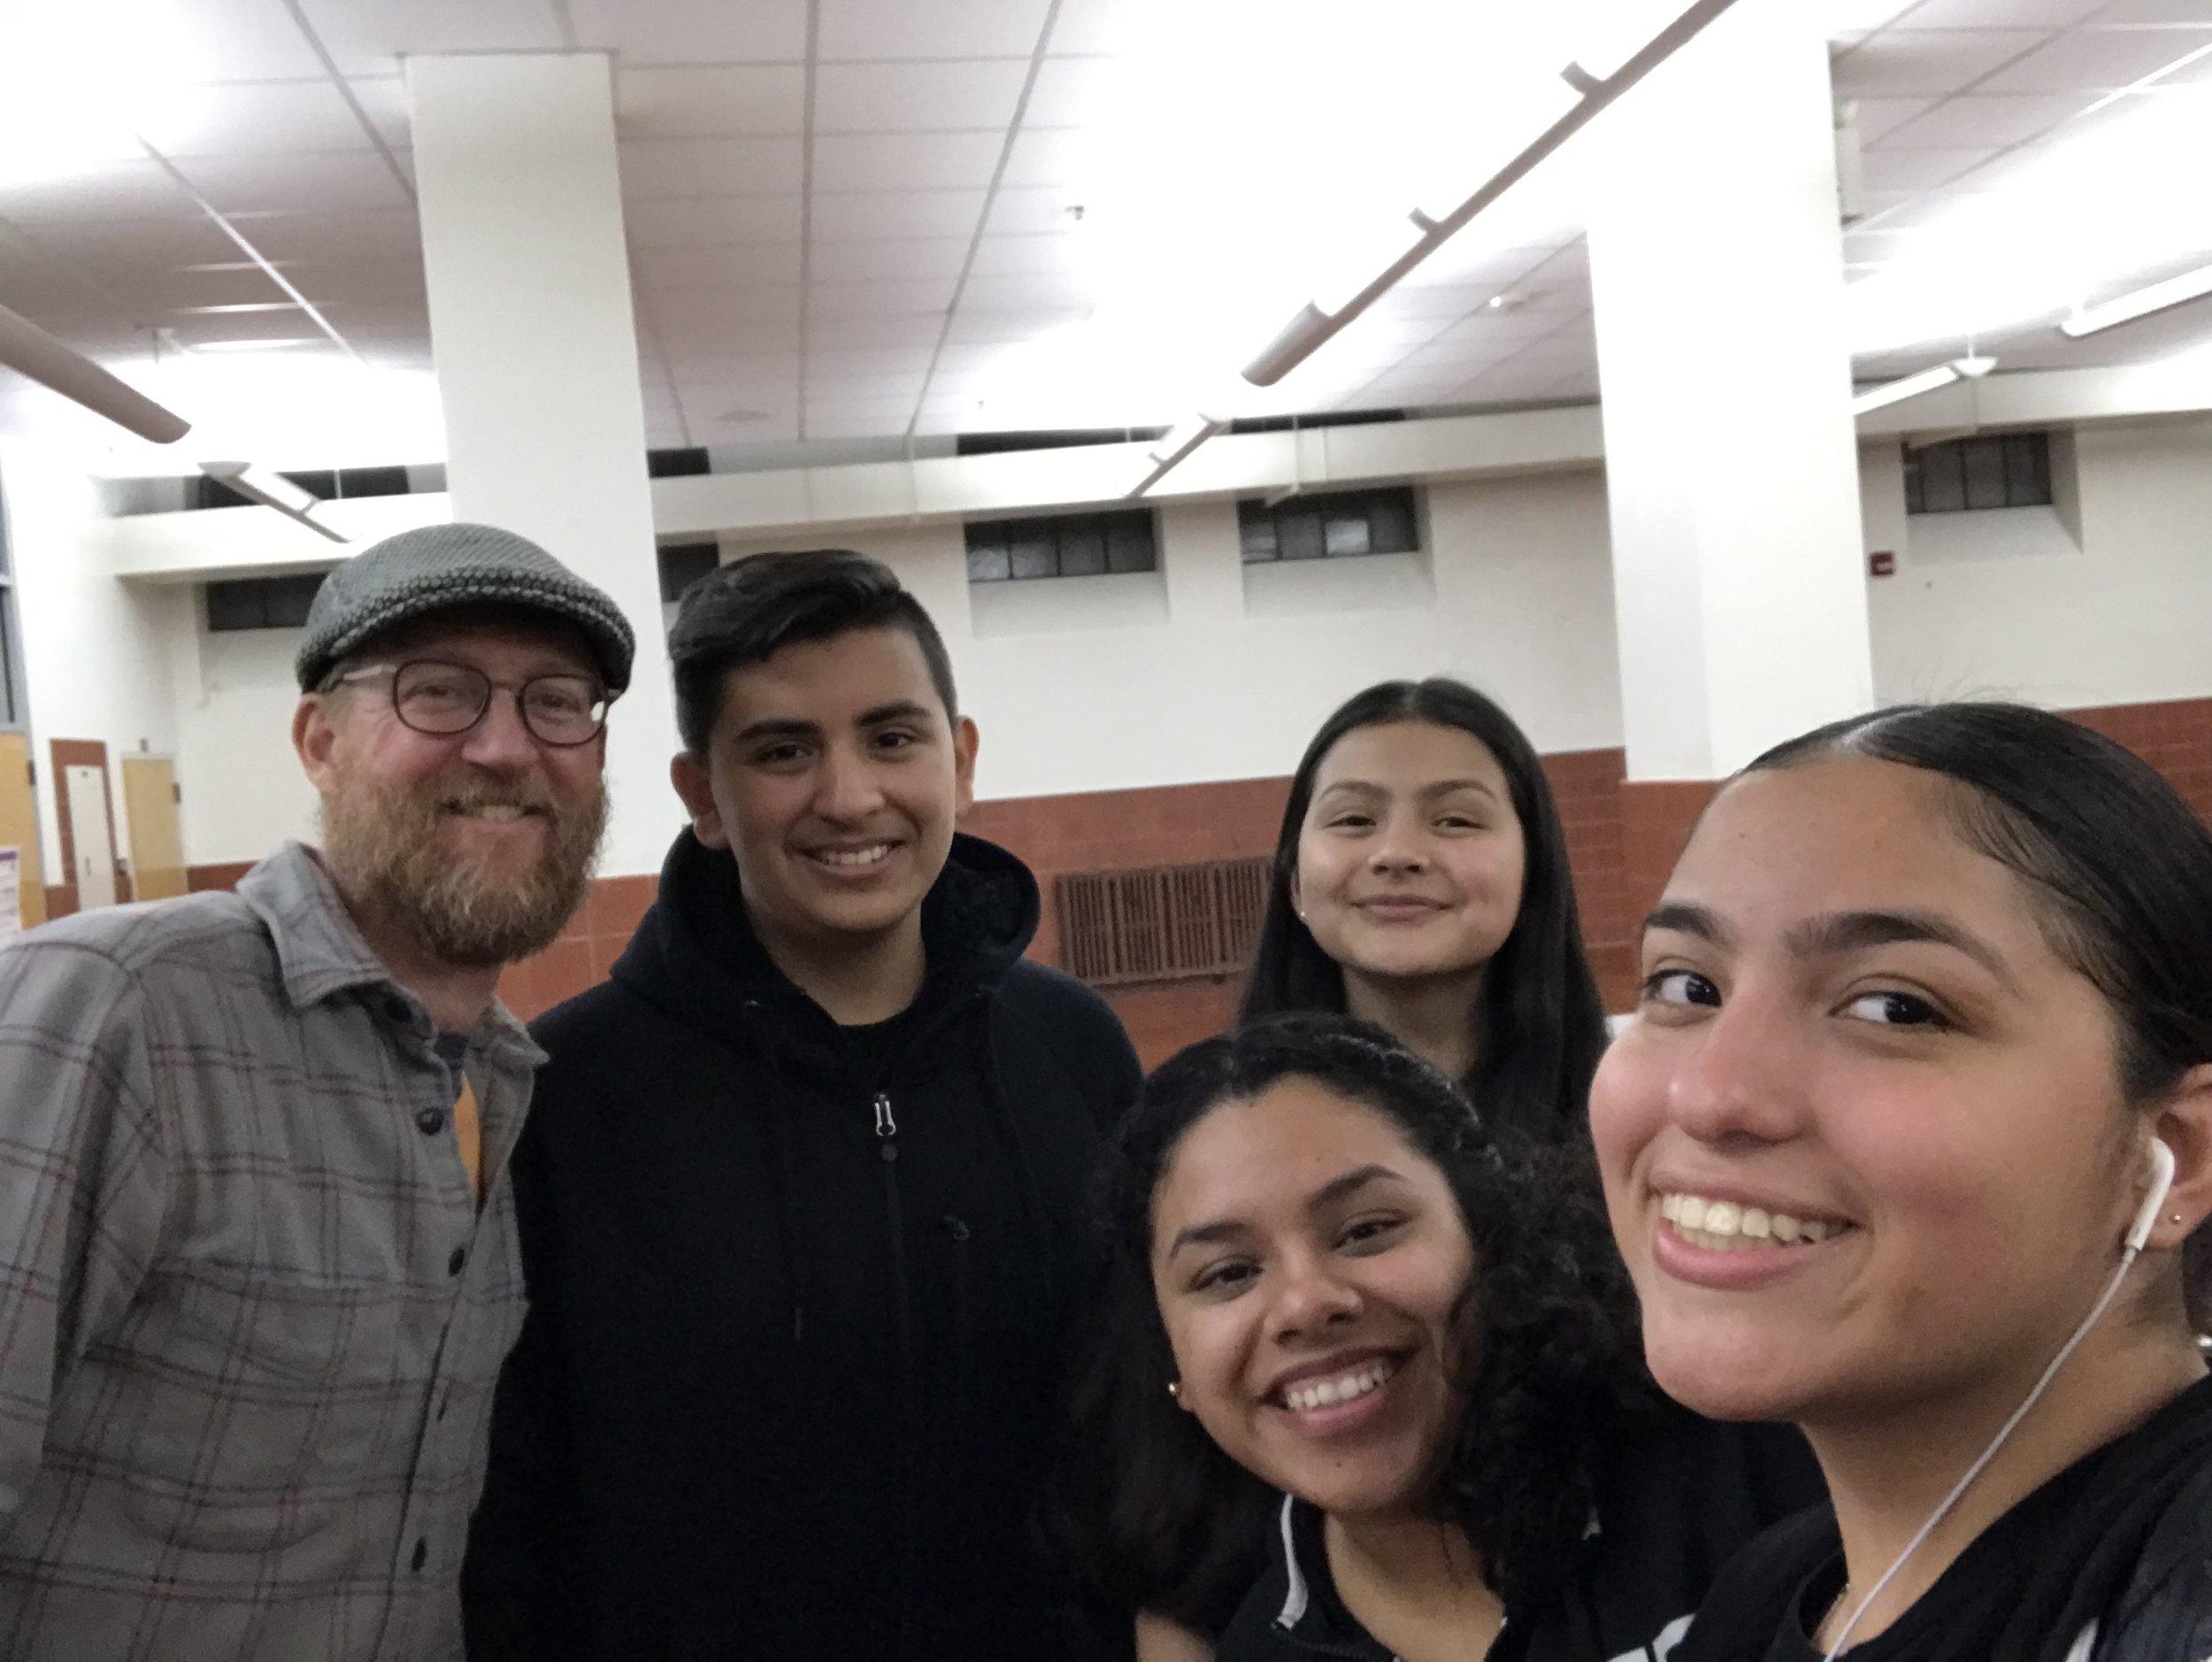 Mr. Amsler and the debate team.